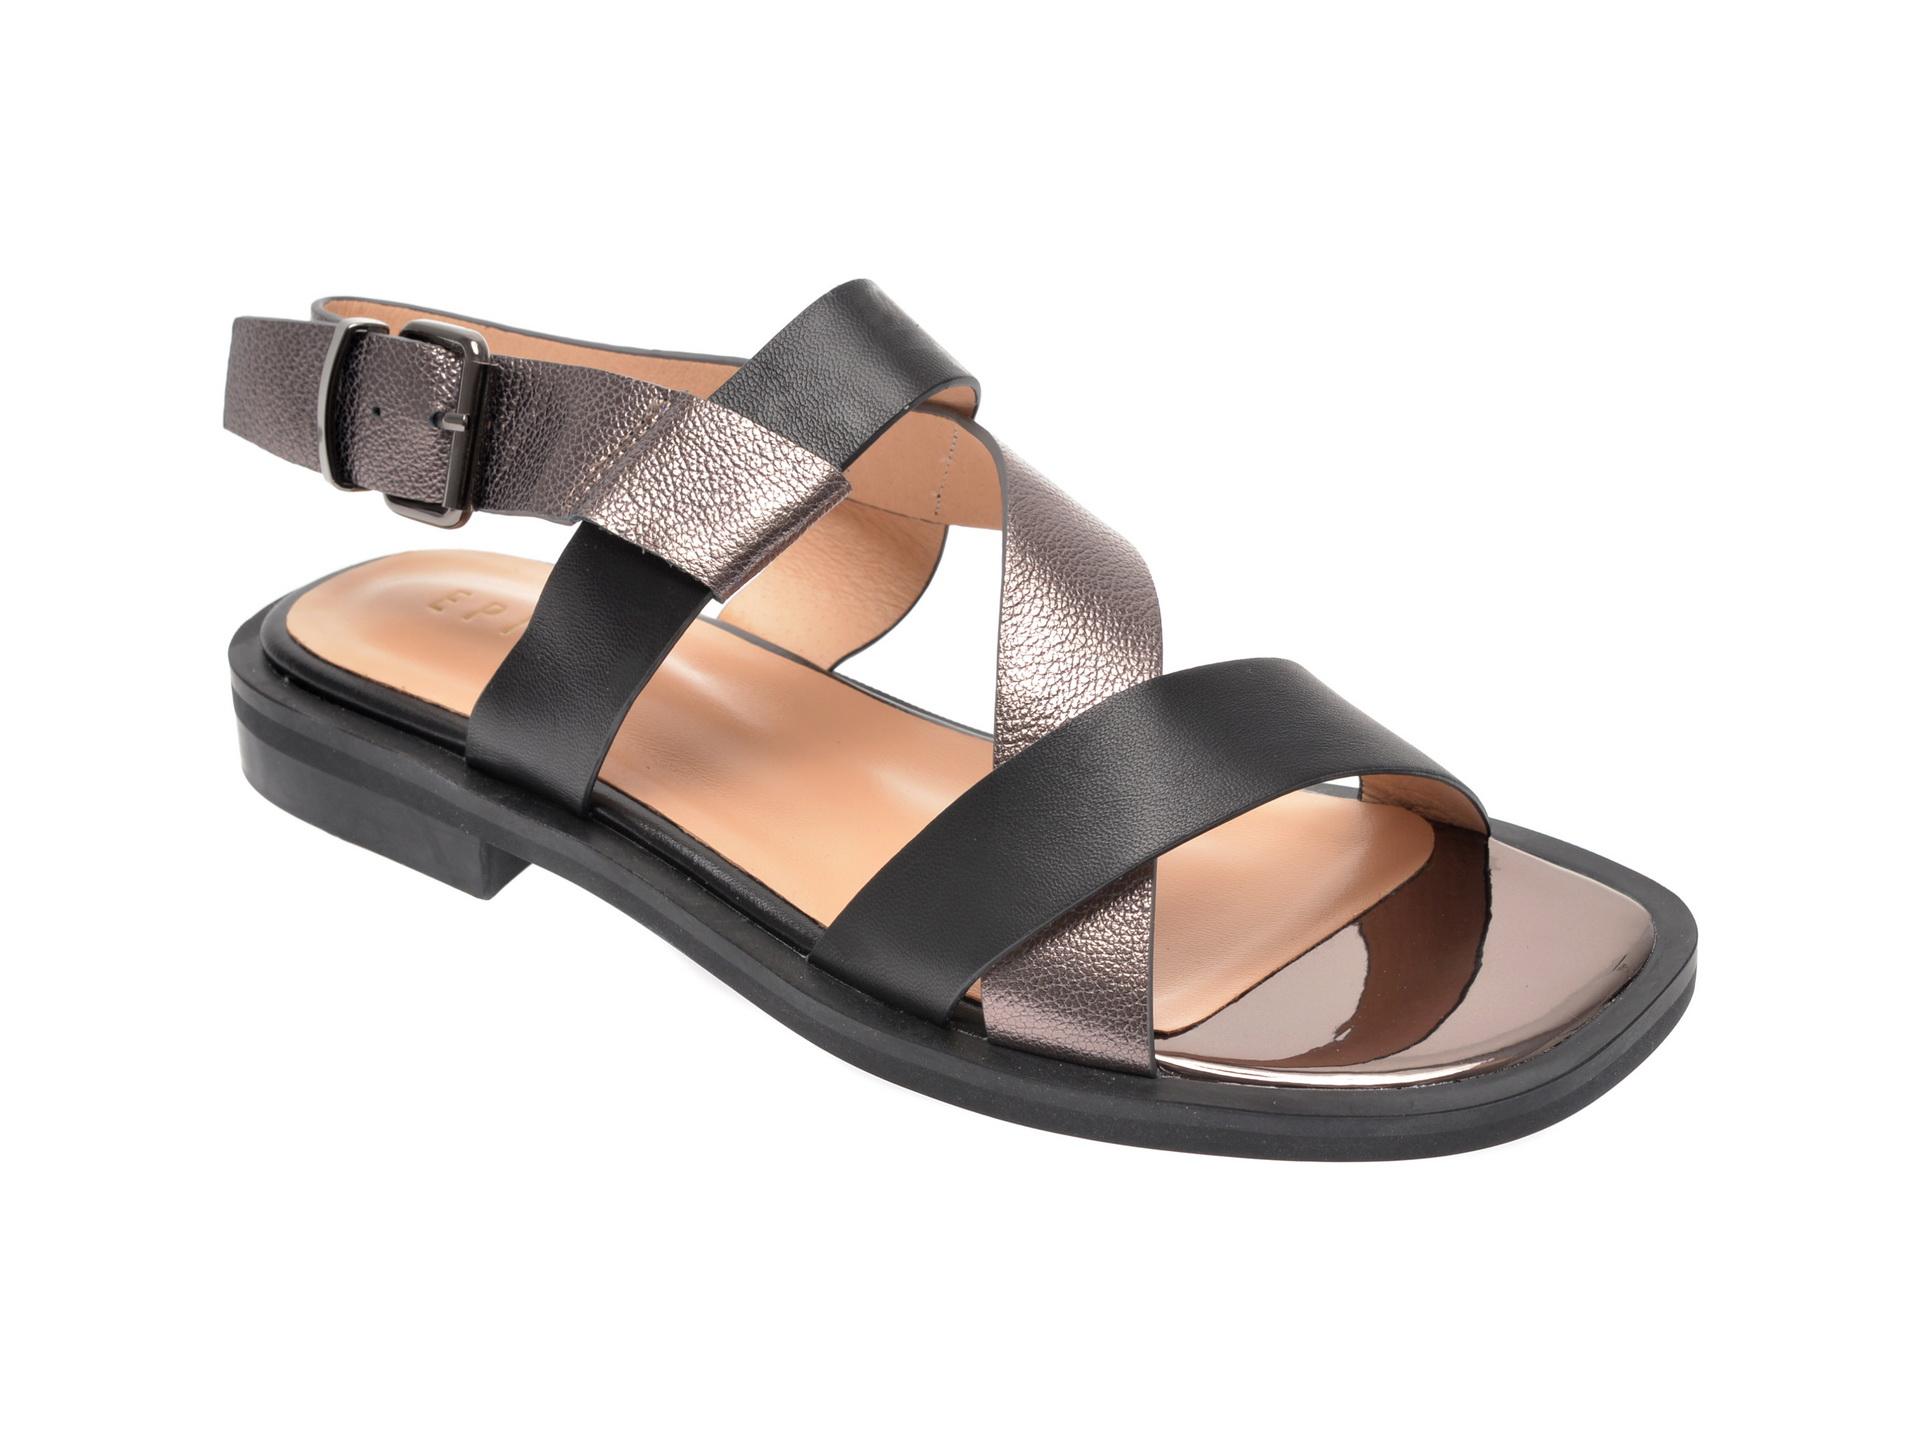 Sandale EPICA negre, 7486907, din piele naturala